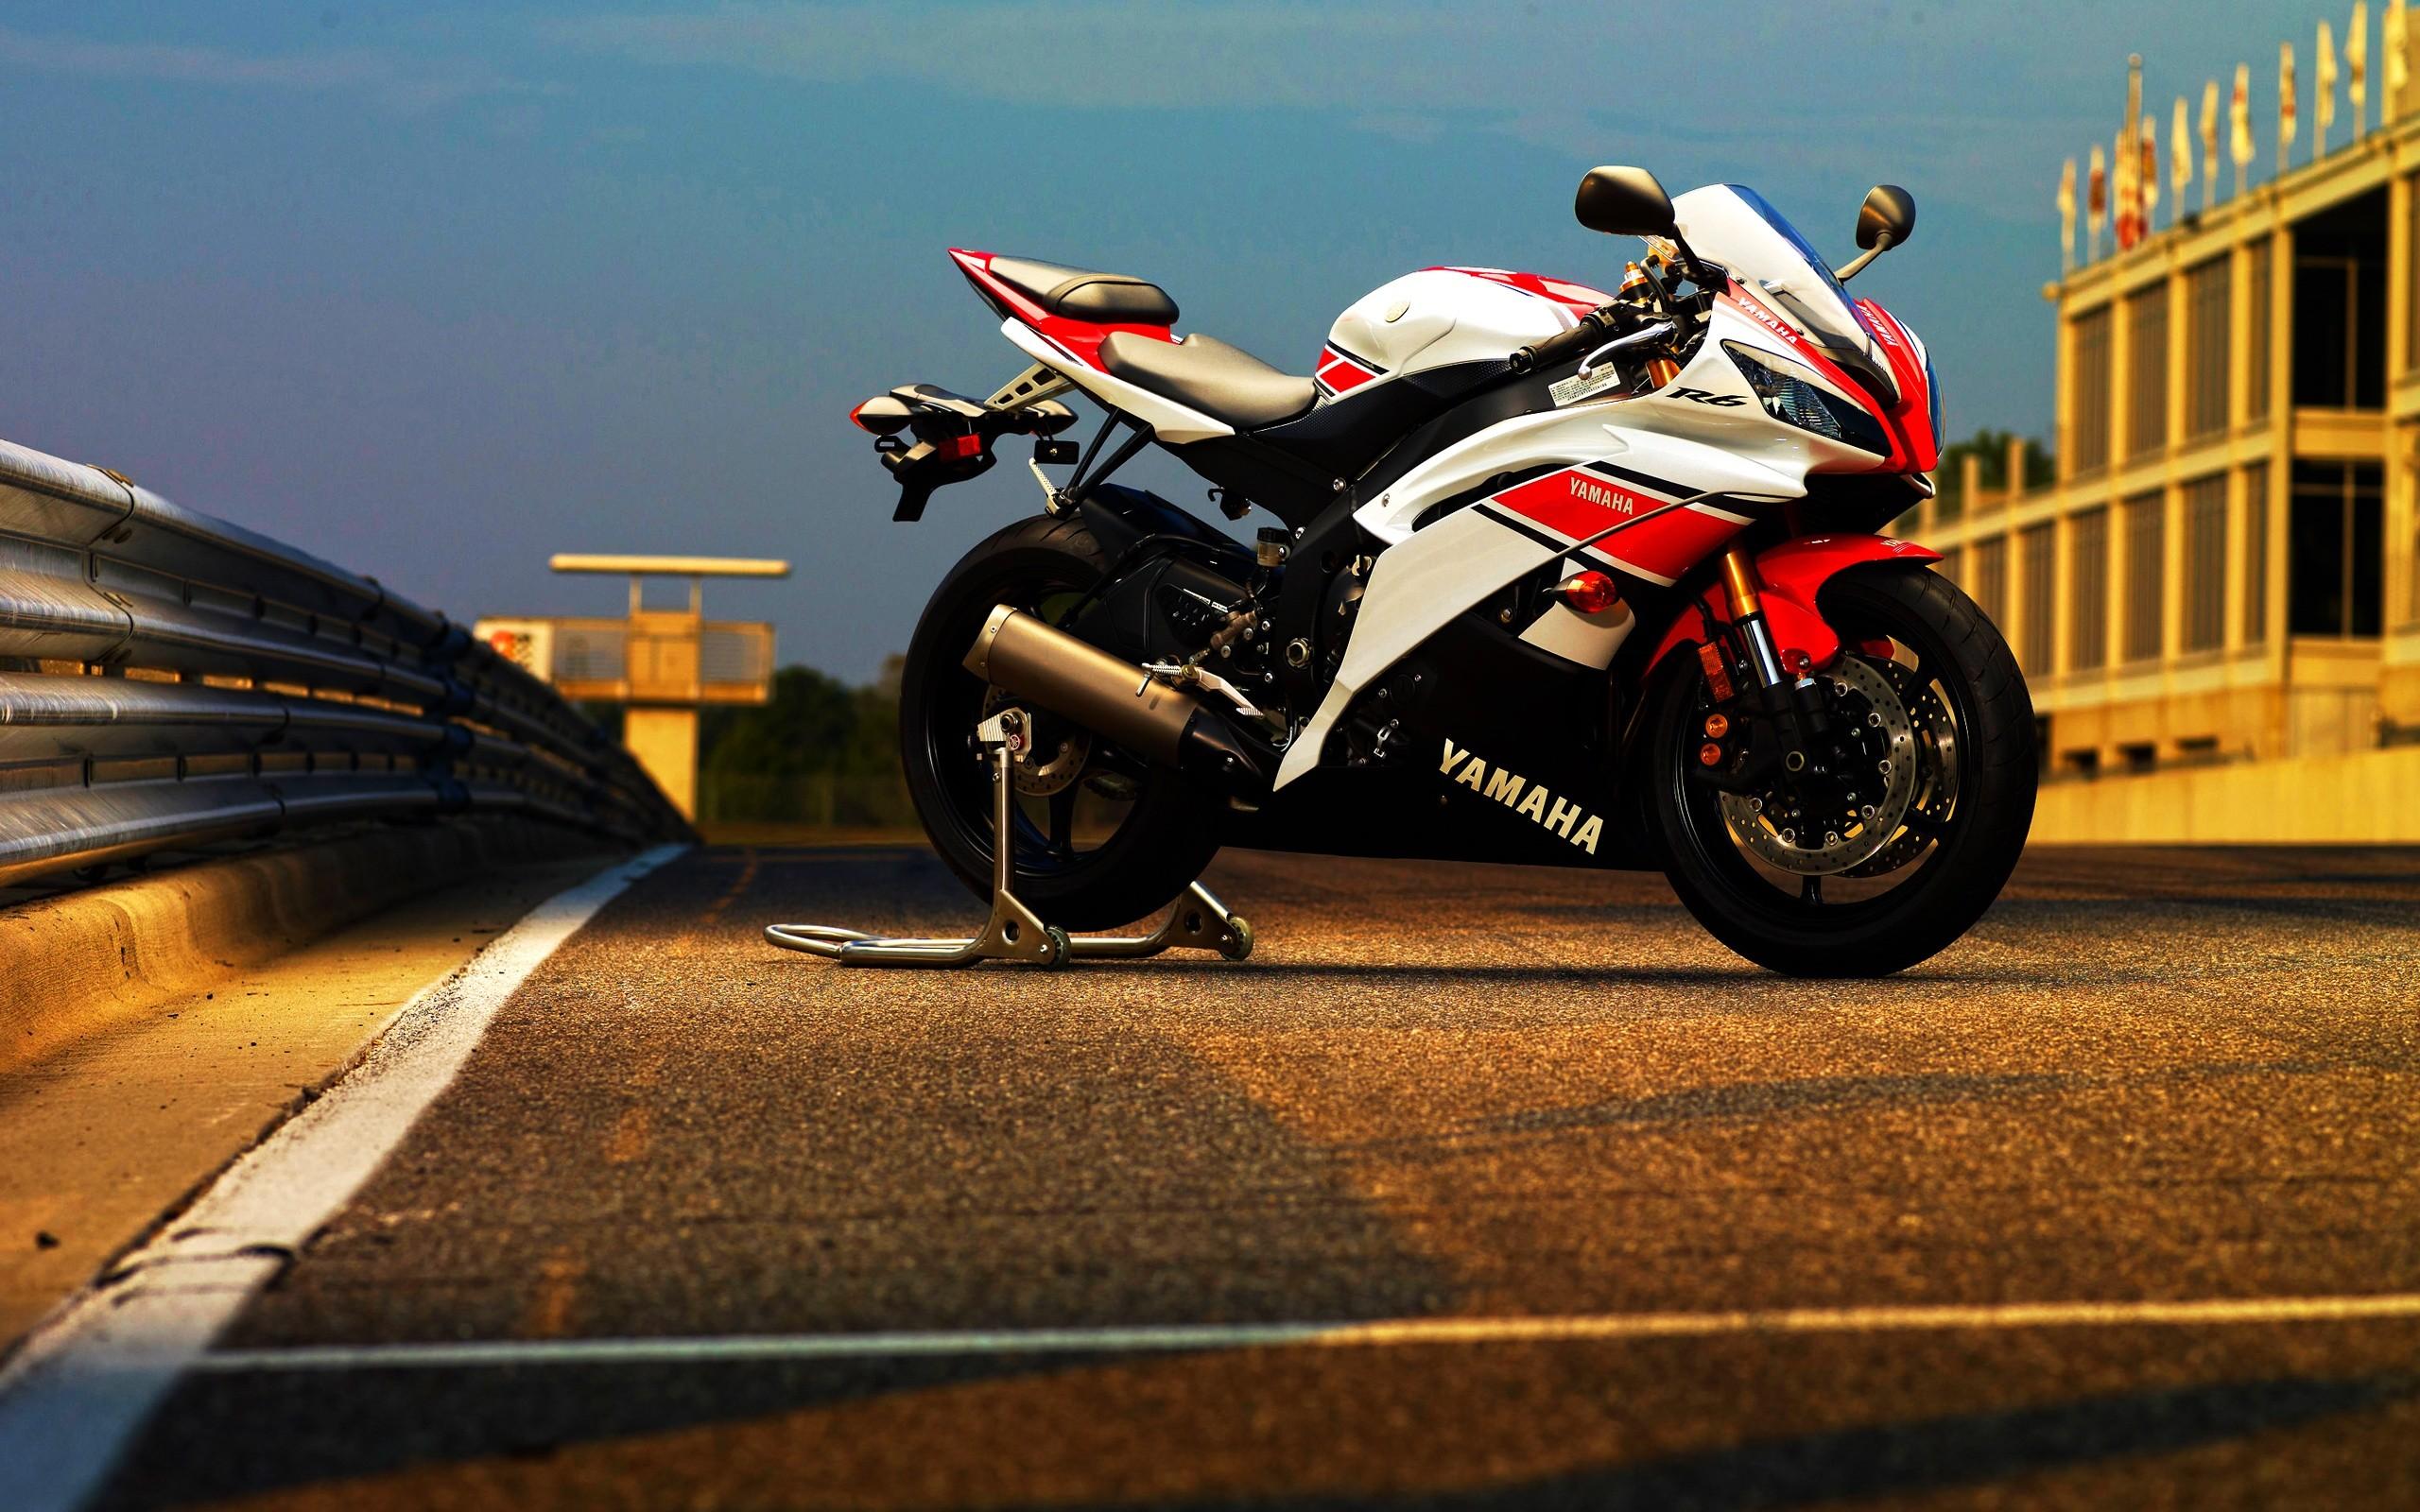 Download Yamaha YZF R6 Wallpaper HD Photos #22931 px 1.23 MB  Motorcycle